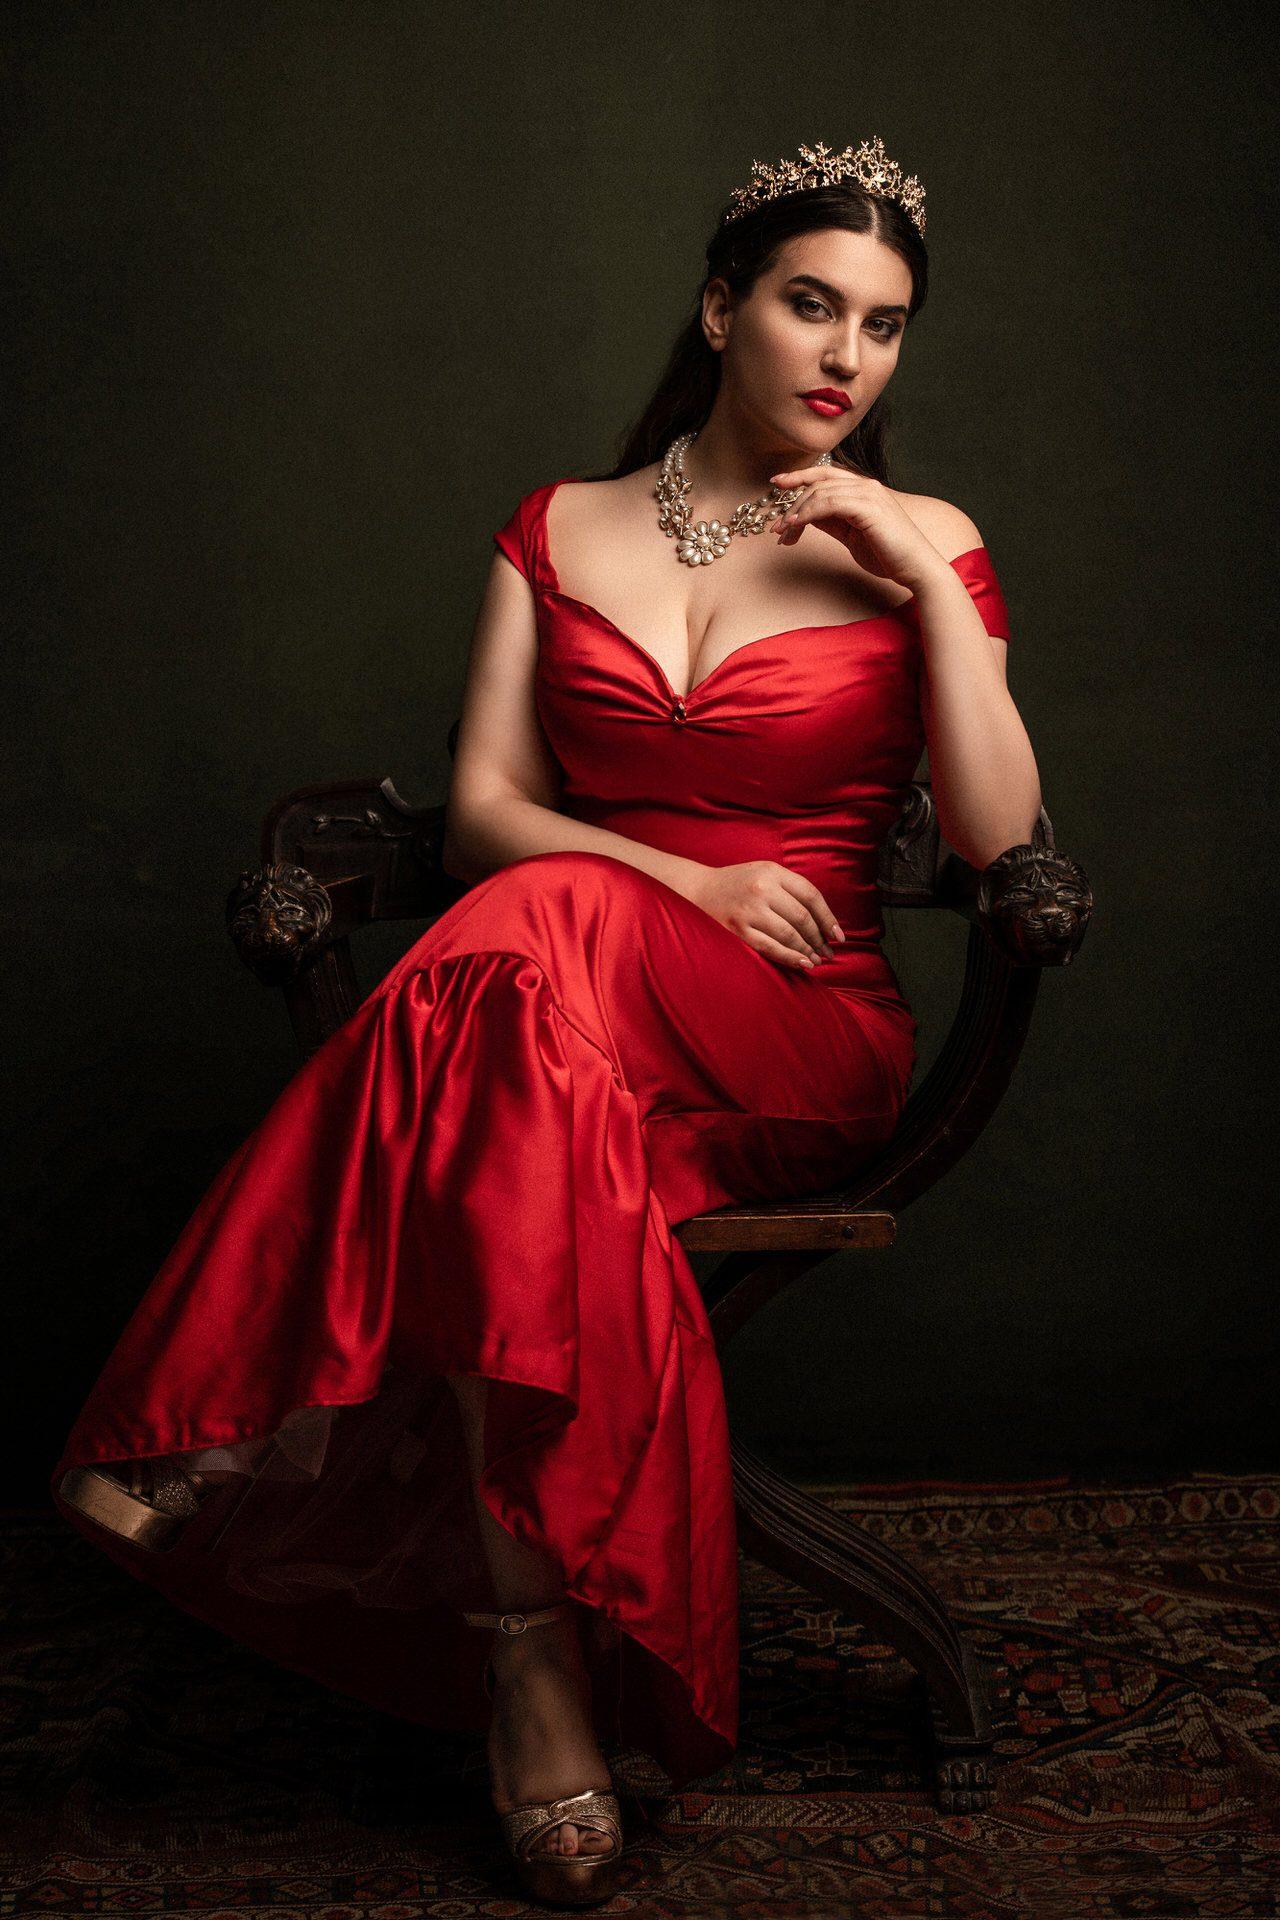 VENUS Gallery - Annalinda Barini Model